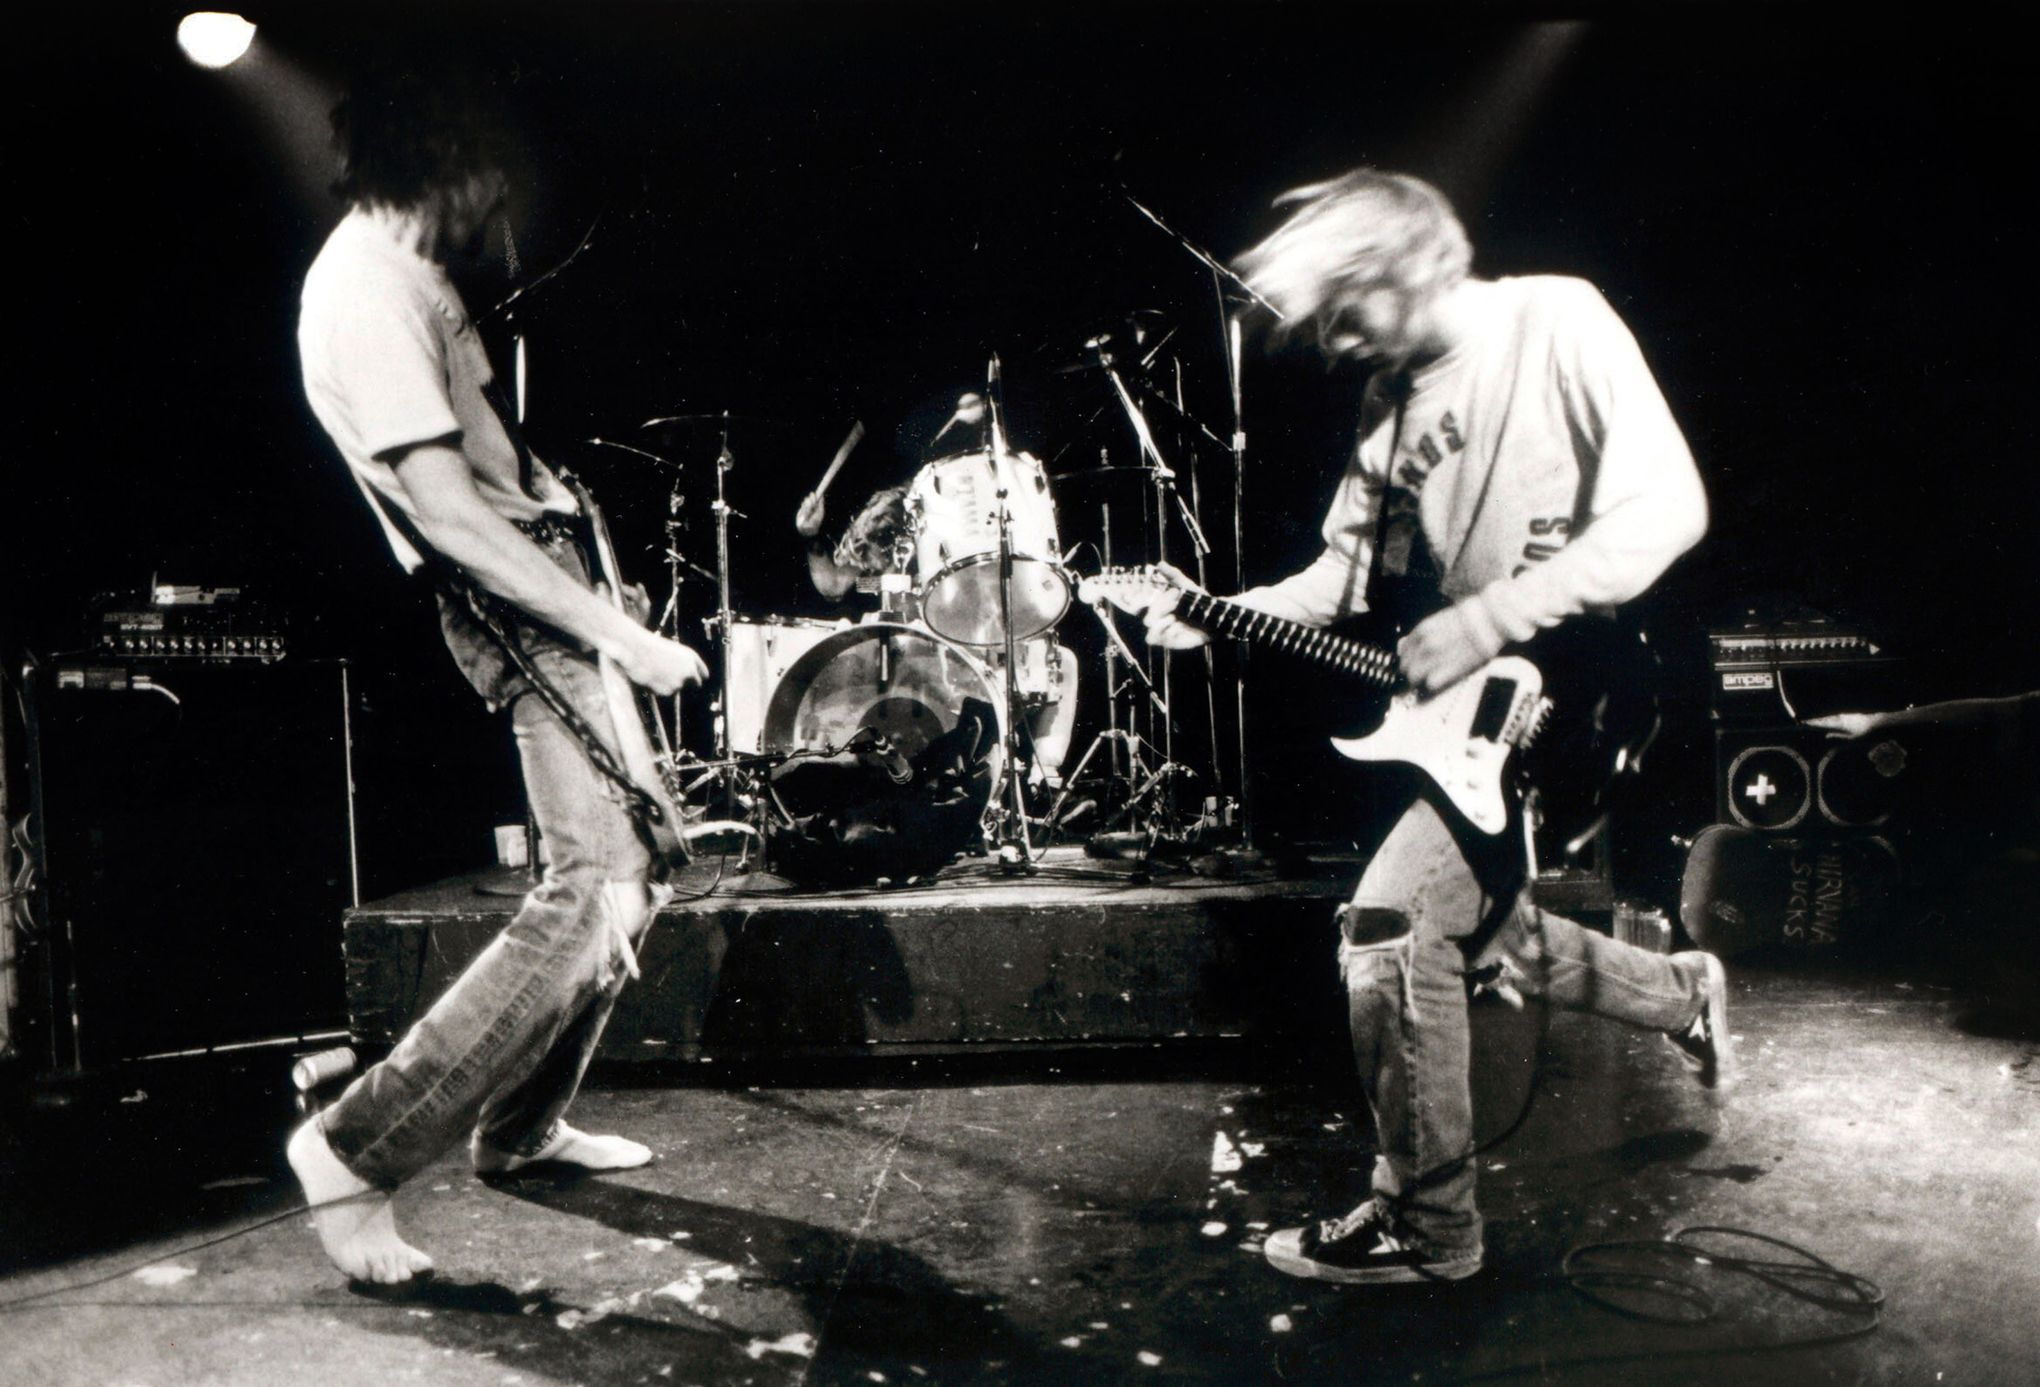 Kurt Cobain aurait eu 50 ans : les dix meilleures reprises de Nirvana depuis sa mort